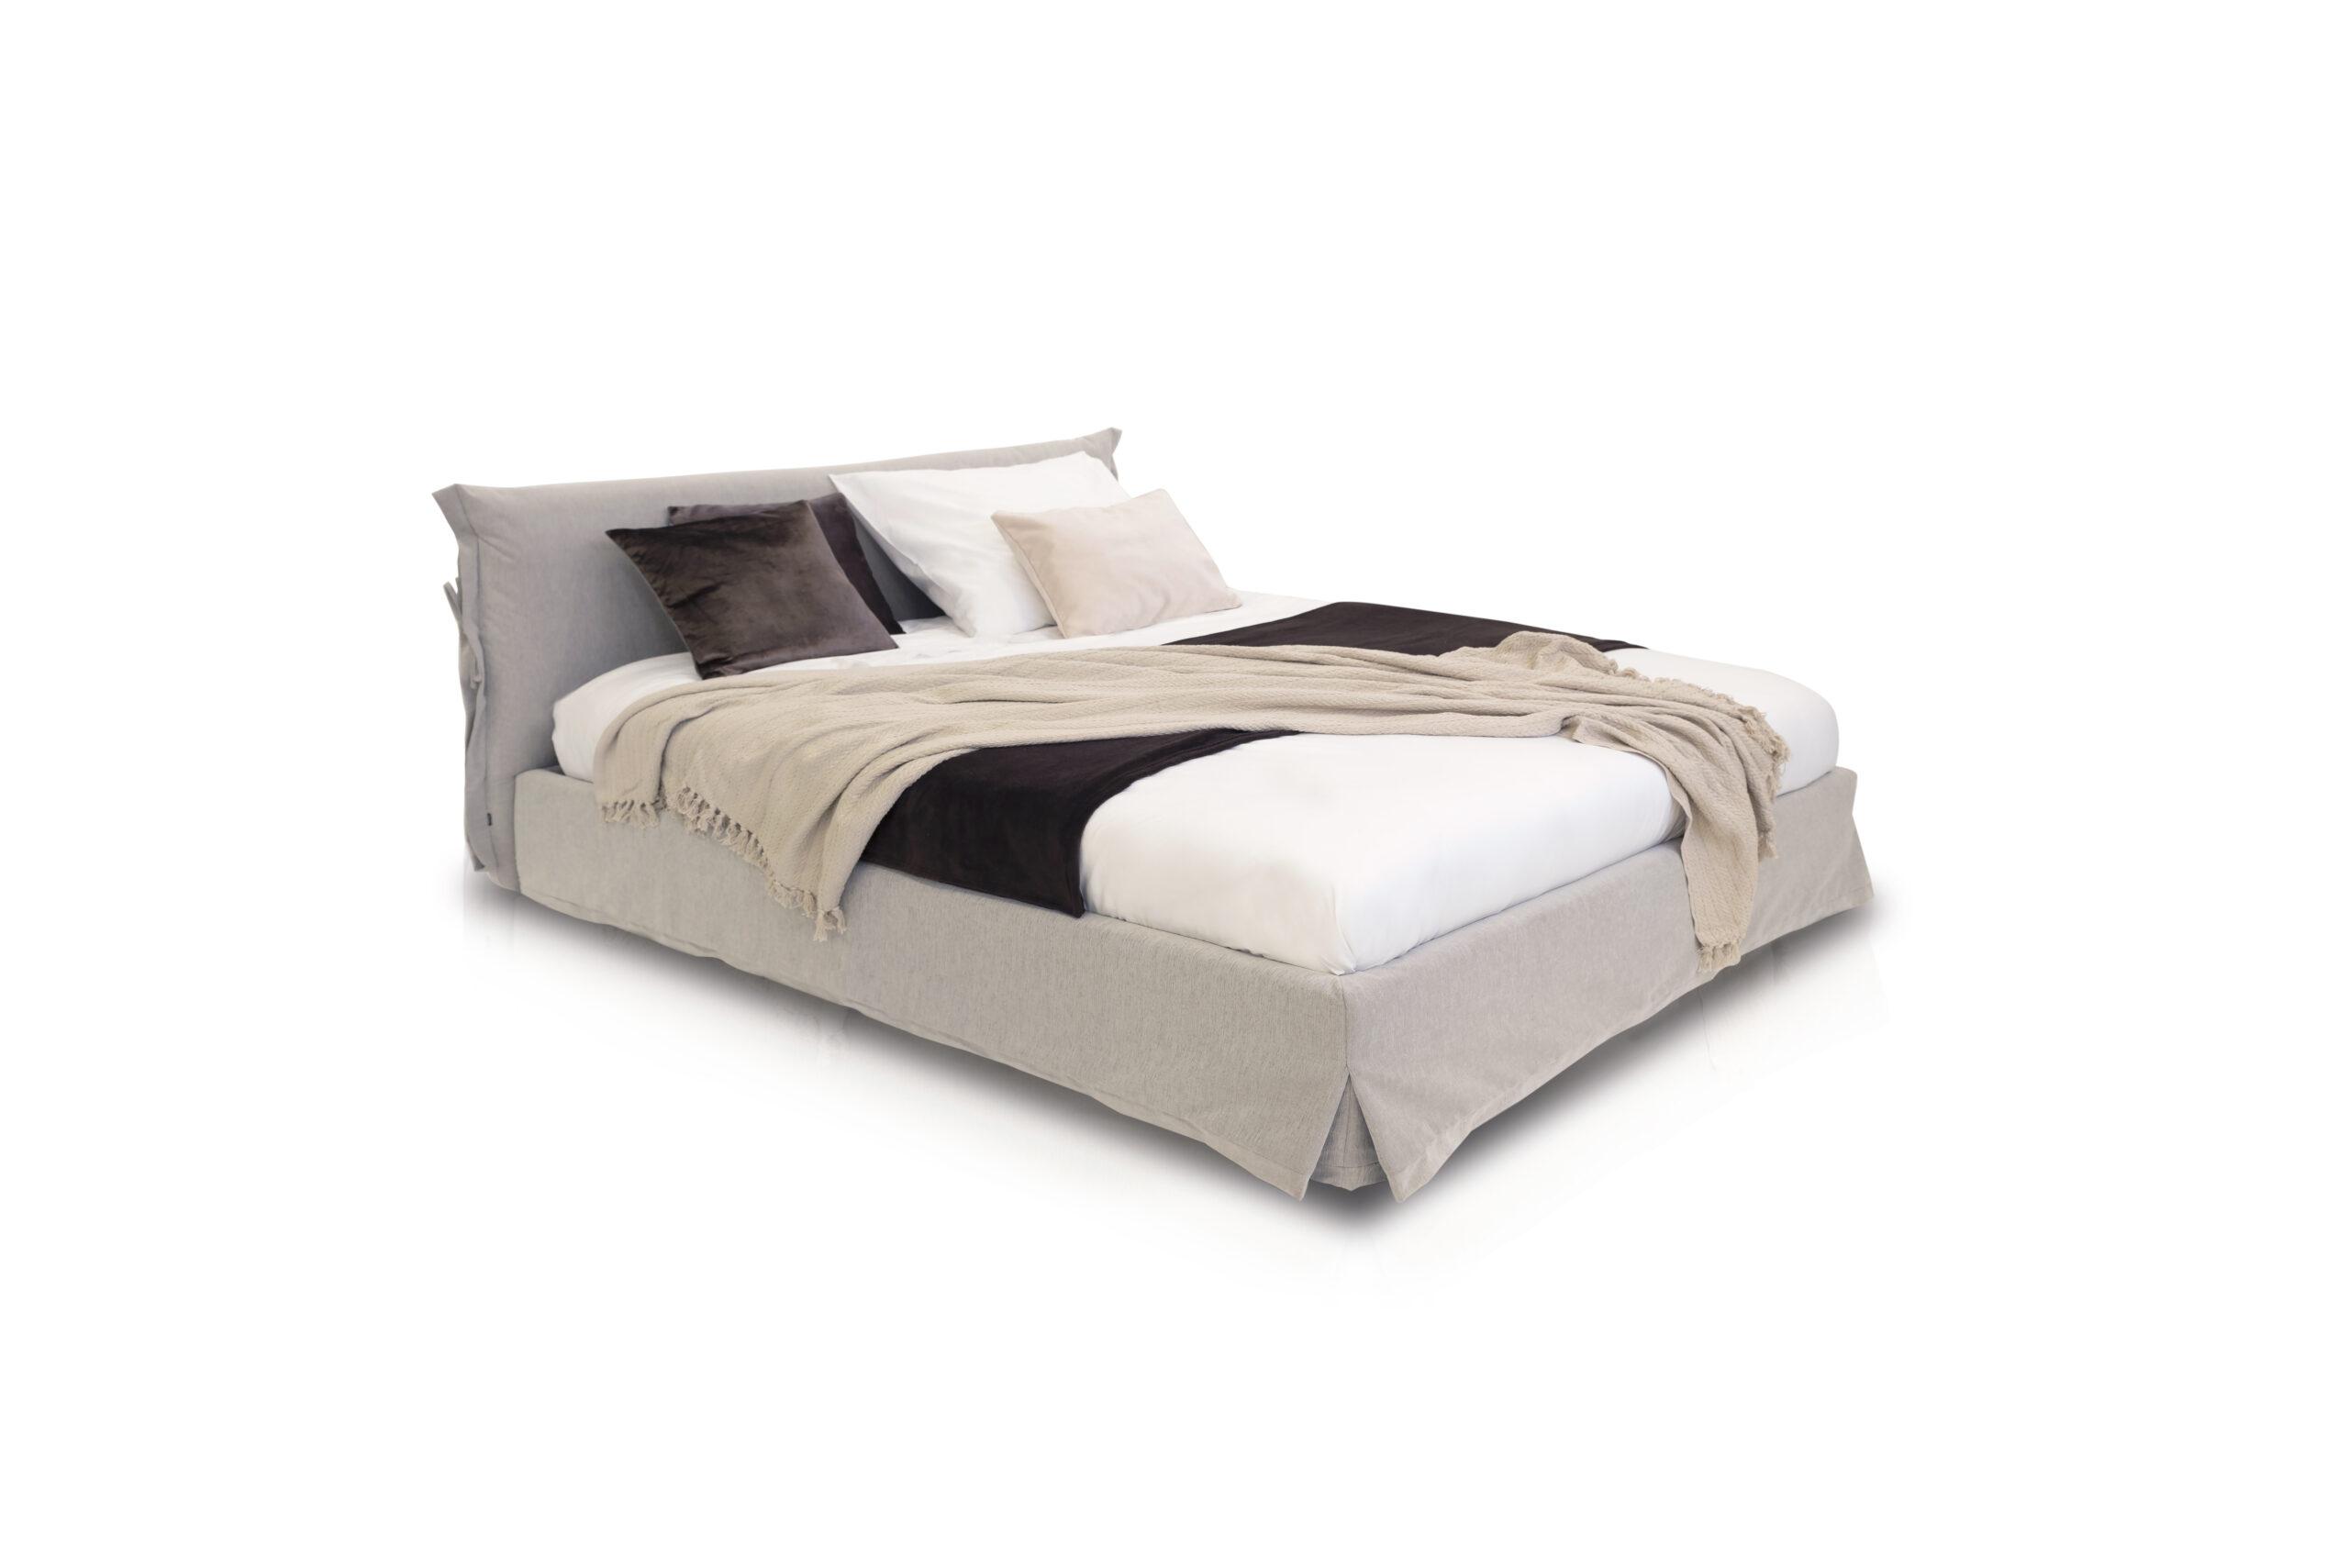 łóżko-piano-nobonobo-persempra1-13 (6)